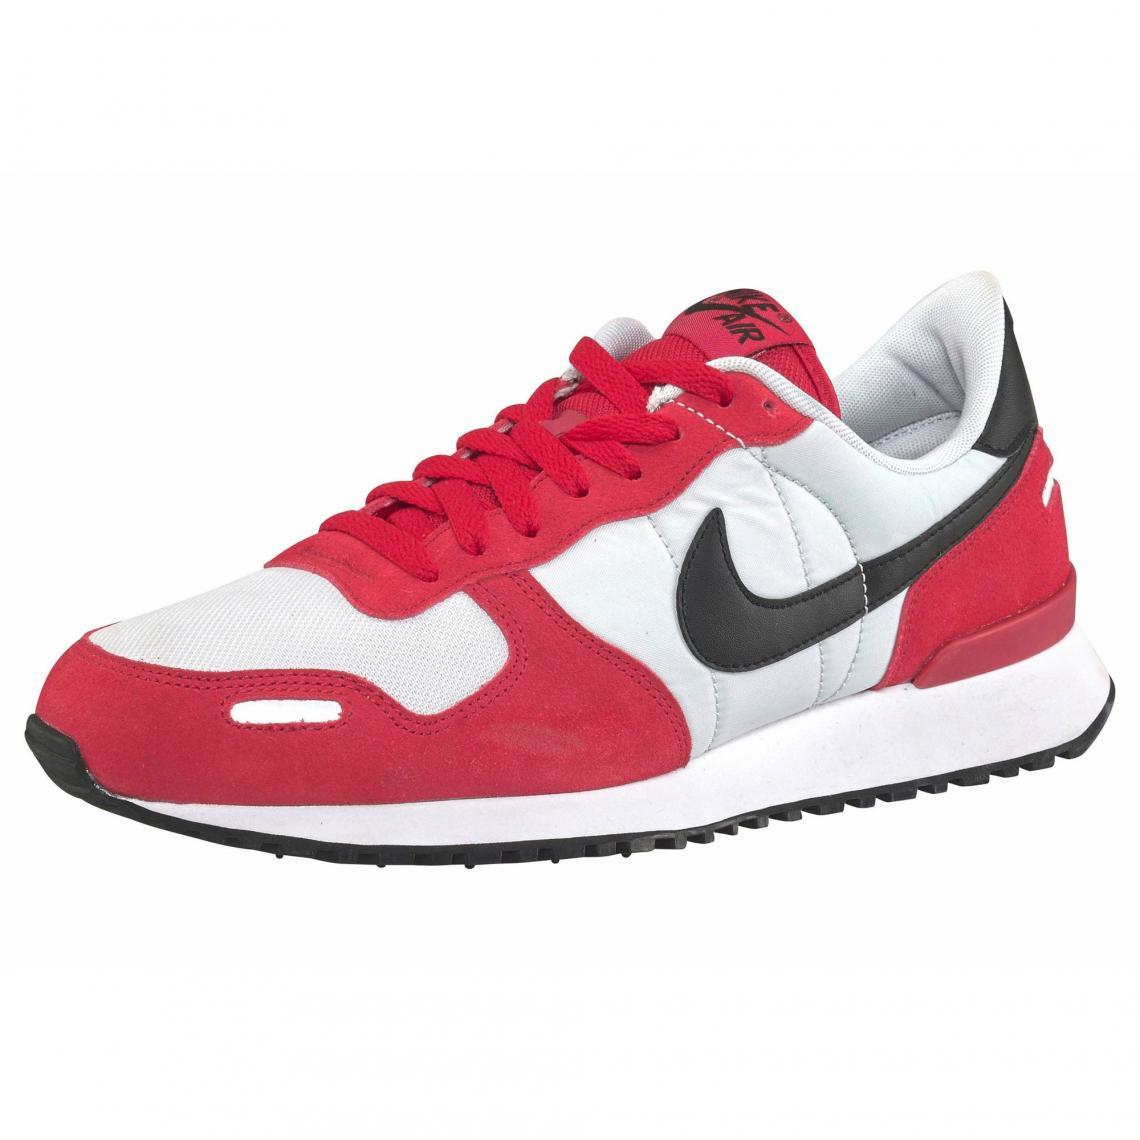 official photos 82e4e 460d3 Nike Air Vortex chaussures de running homme - Rouge - Noir Nike Homme